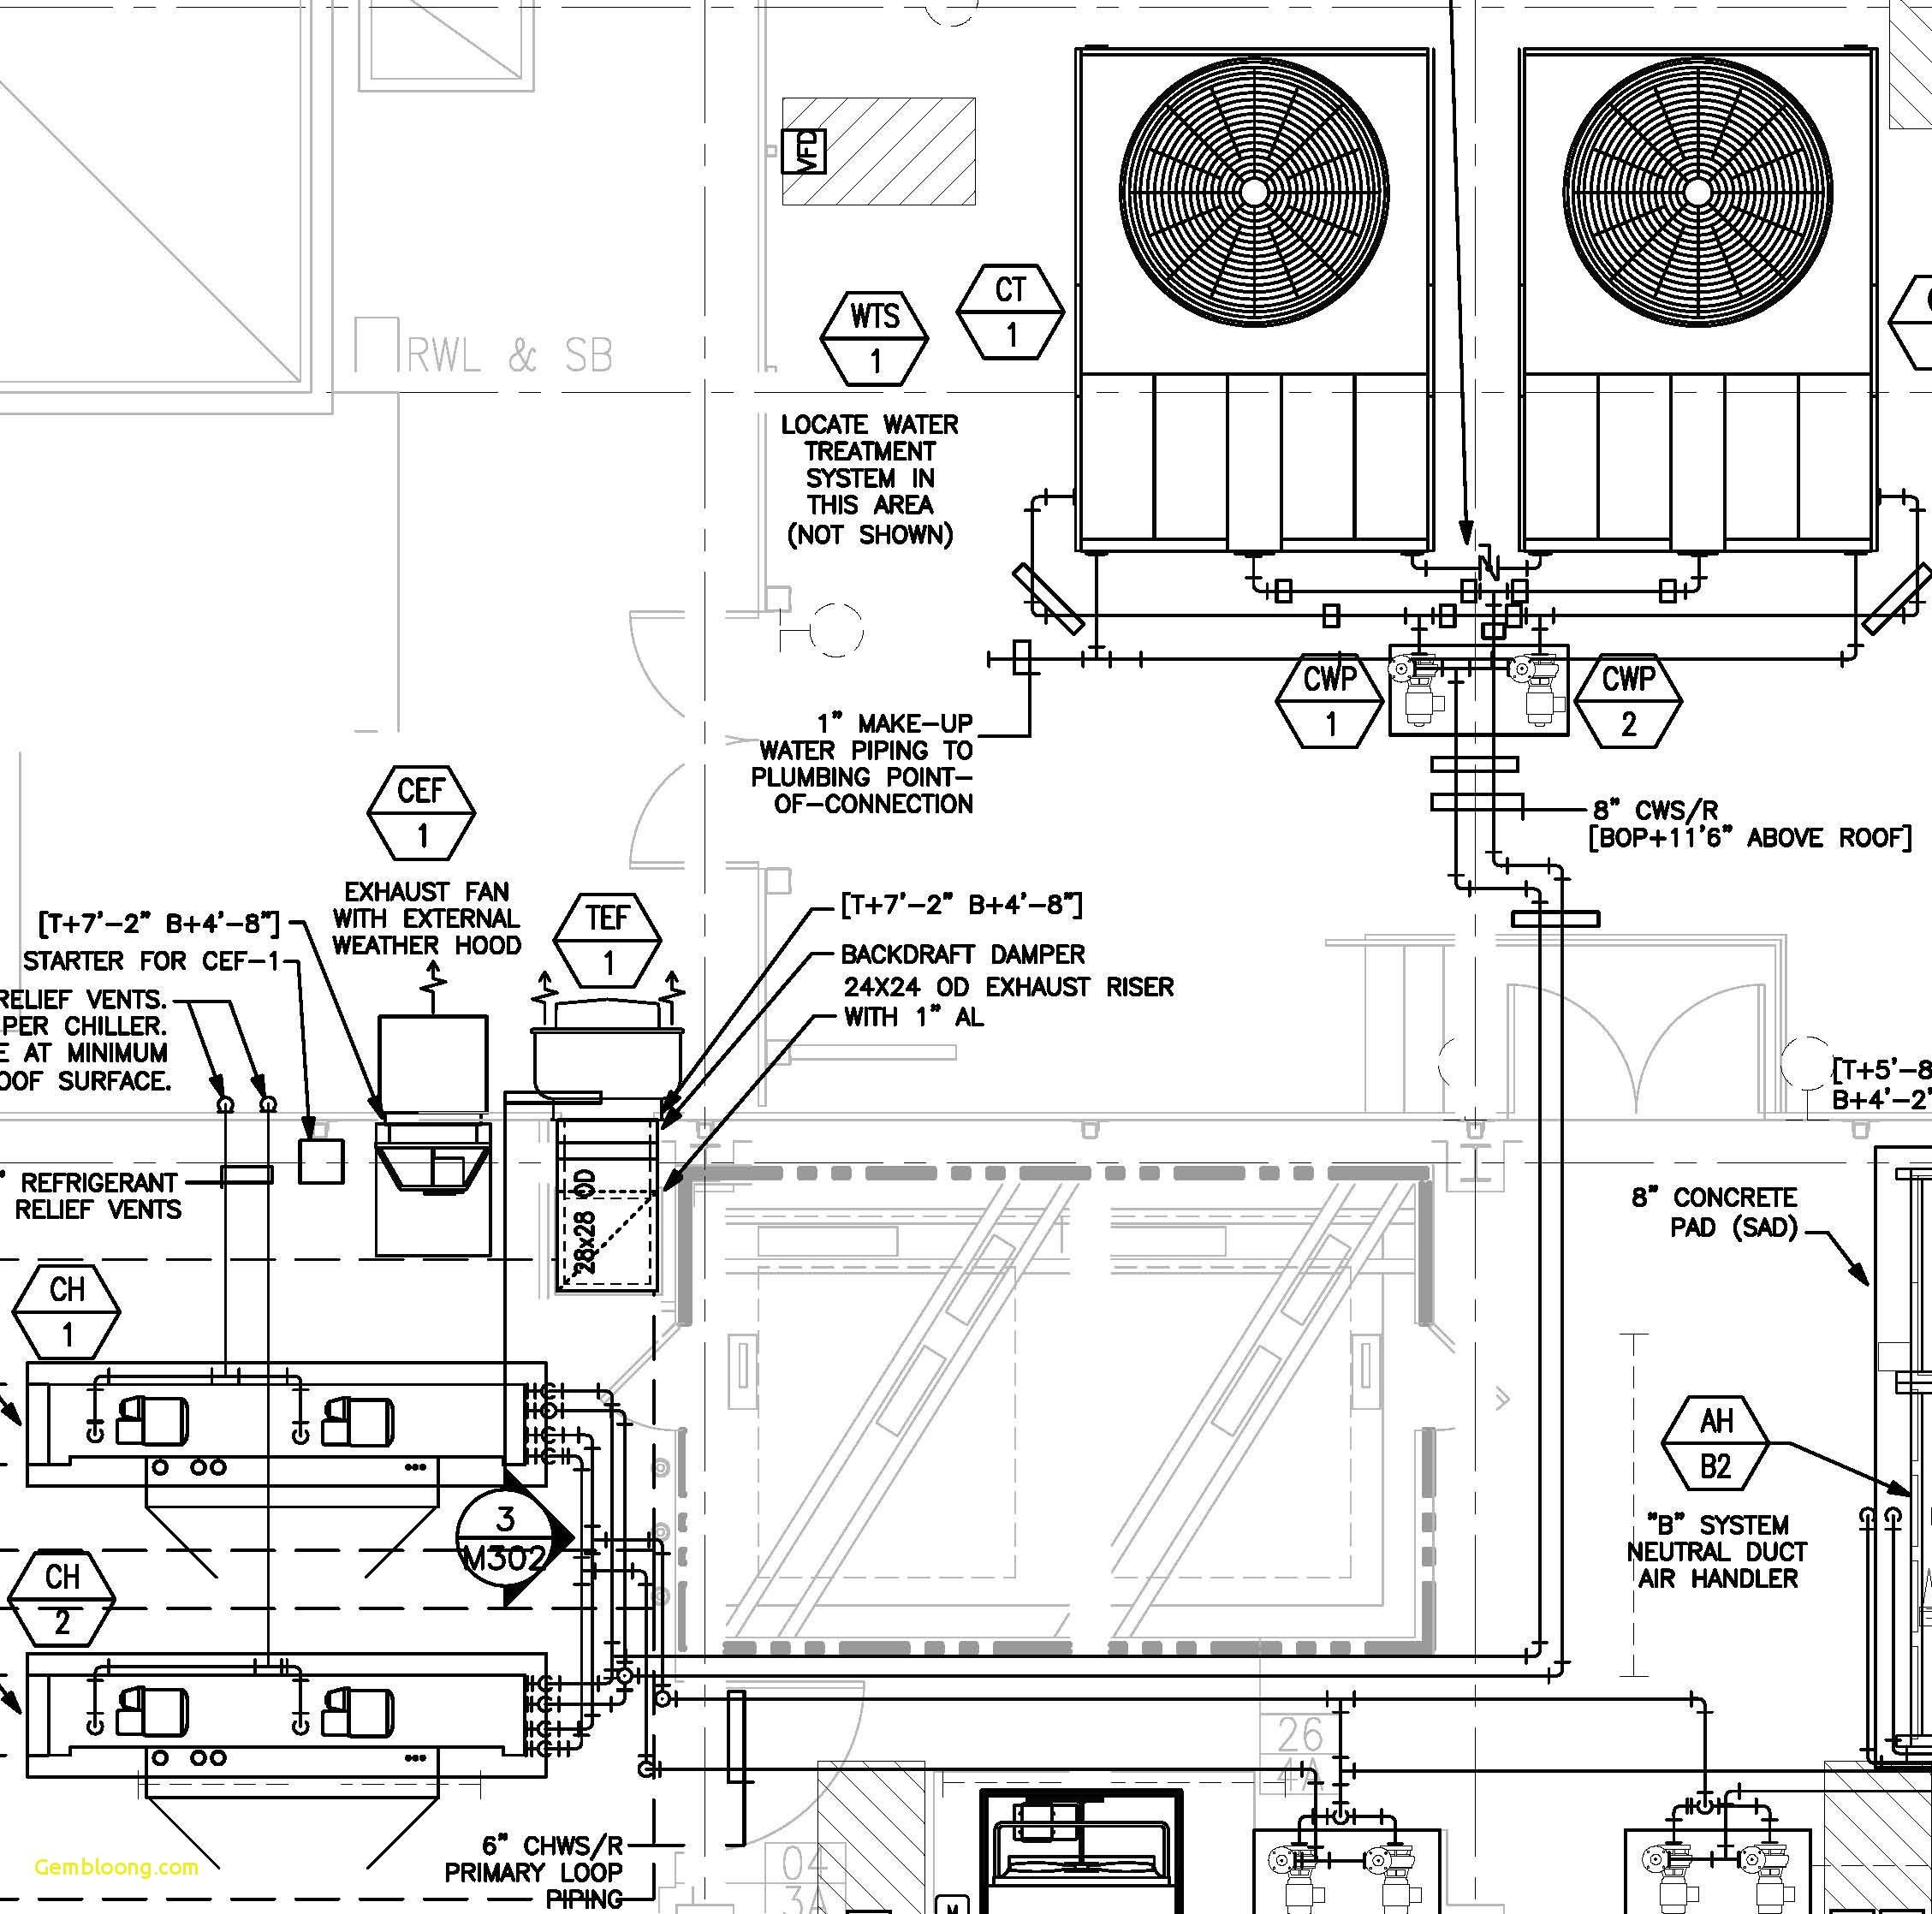 Ford Fiesta Engine Diagram Download Bmw E36 Dme Wiring Diagram Wiring Diagram Bmw E36 Archives Of Ford Fiesta Engine Diagram